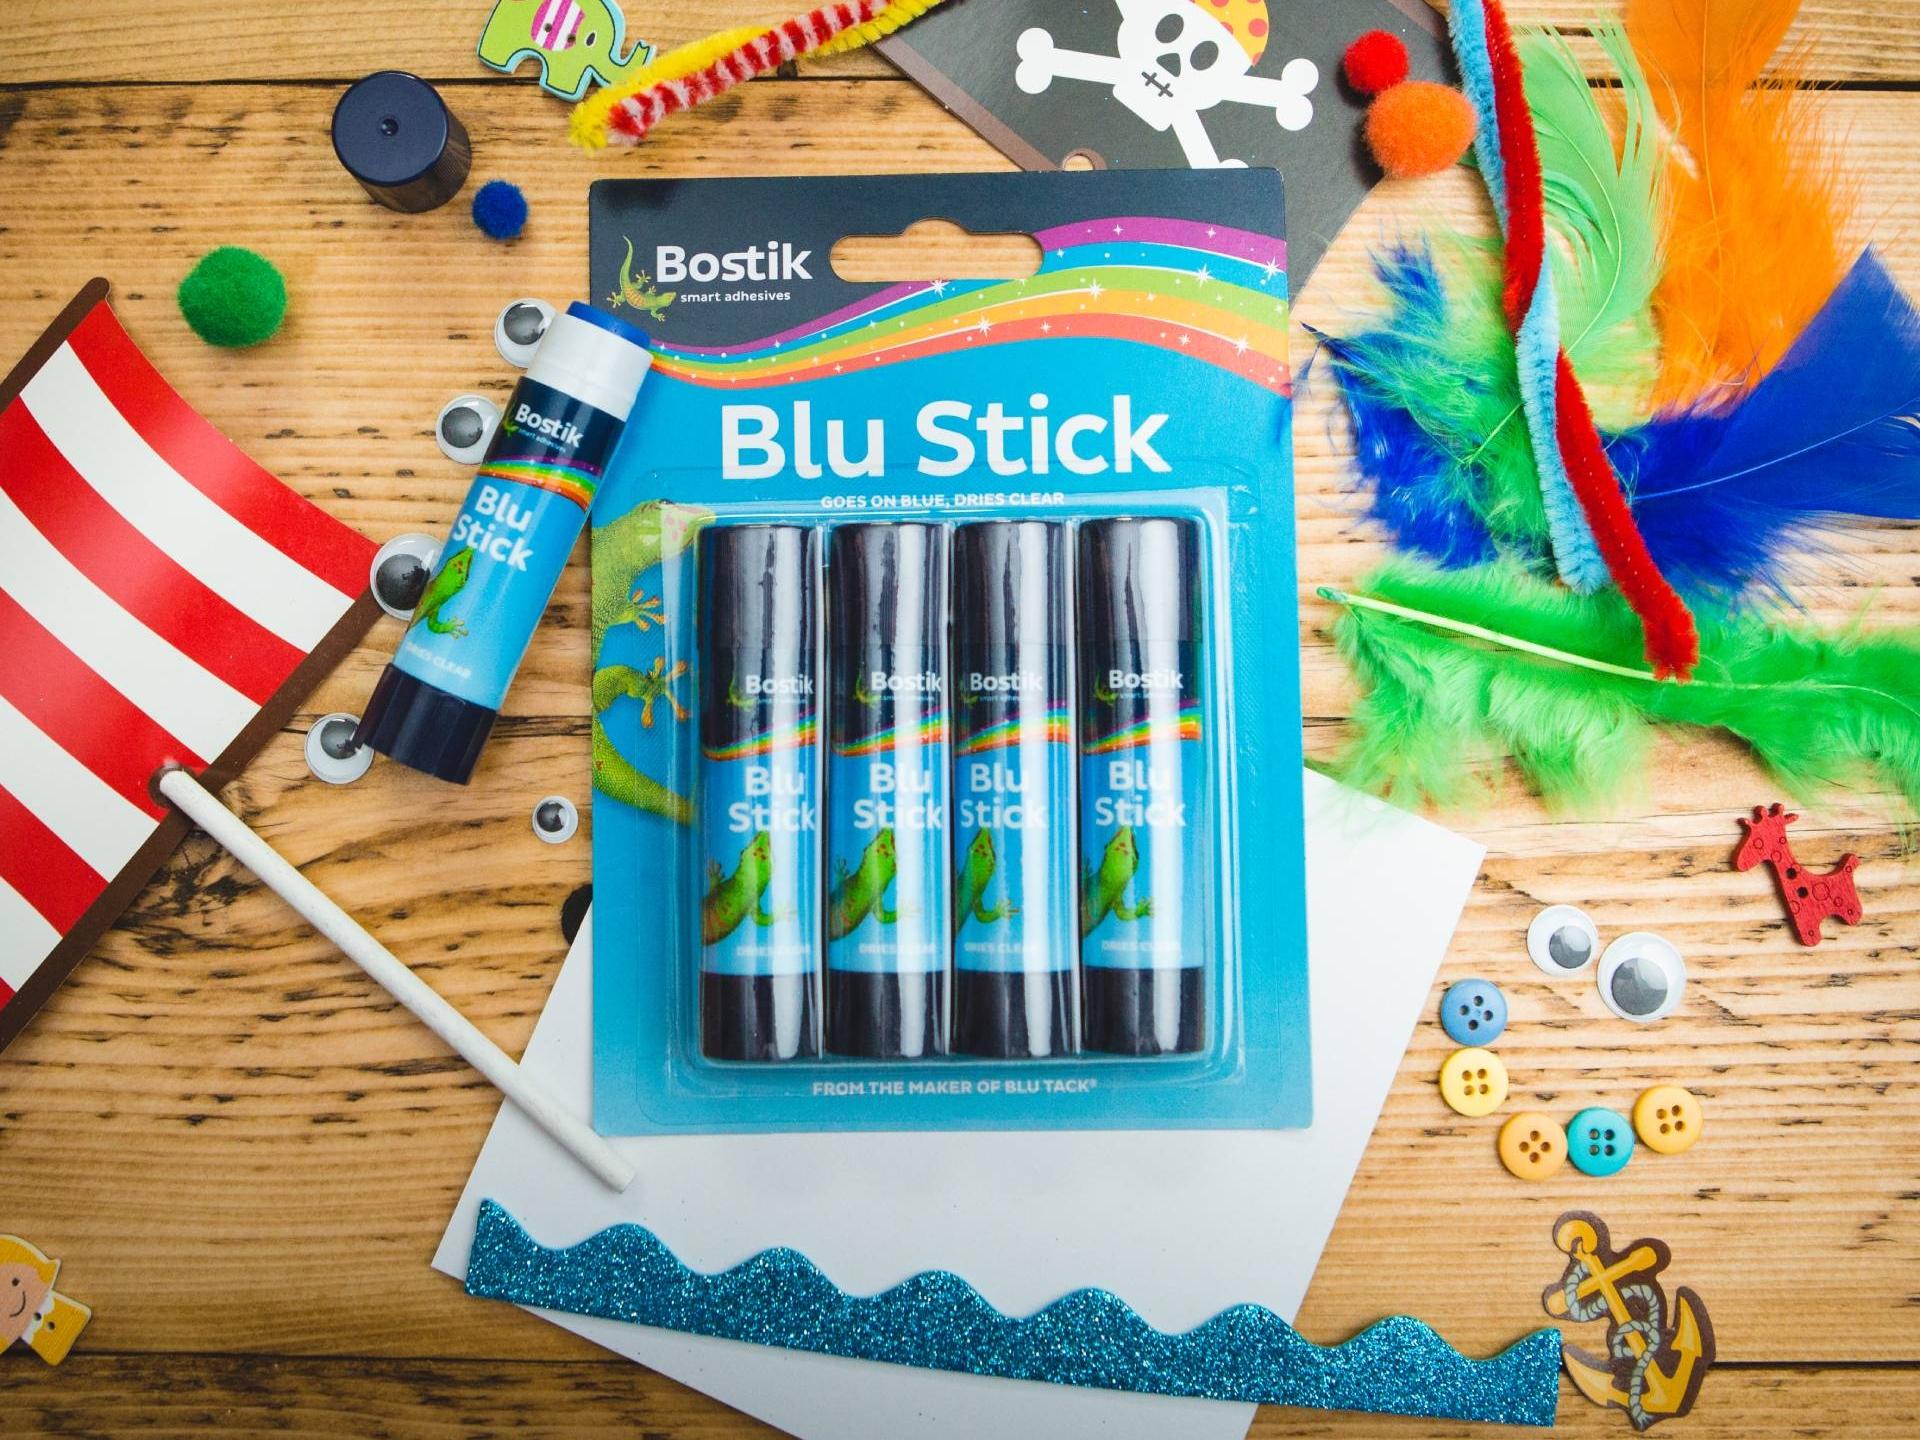 Bostik DIY Bue Stick 2